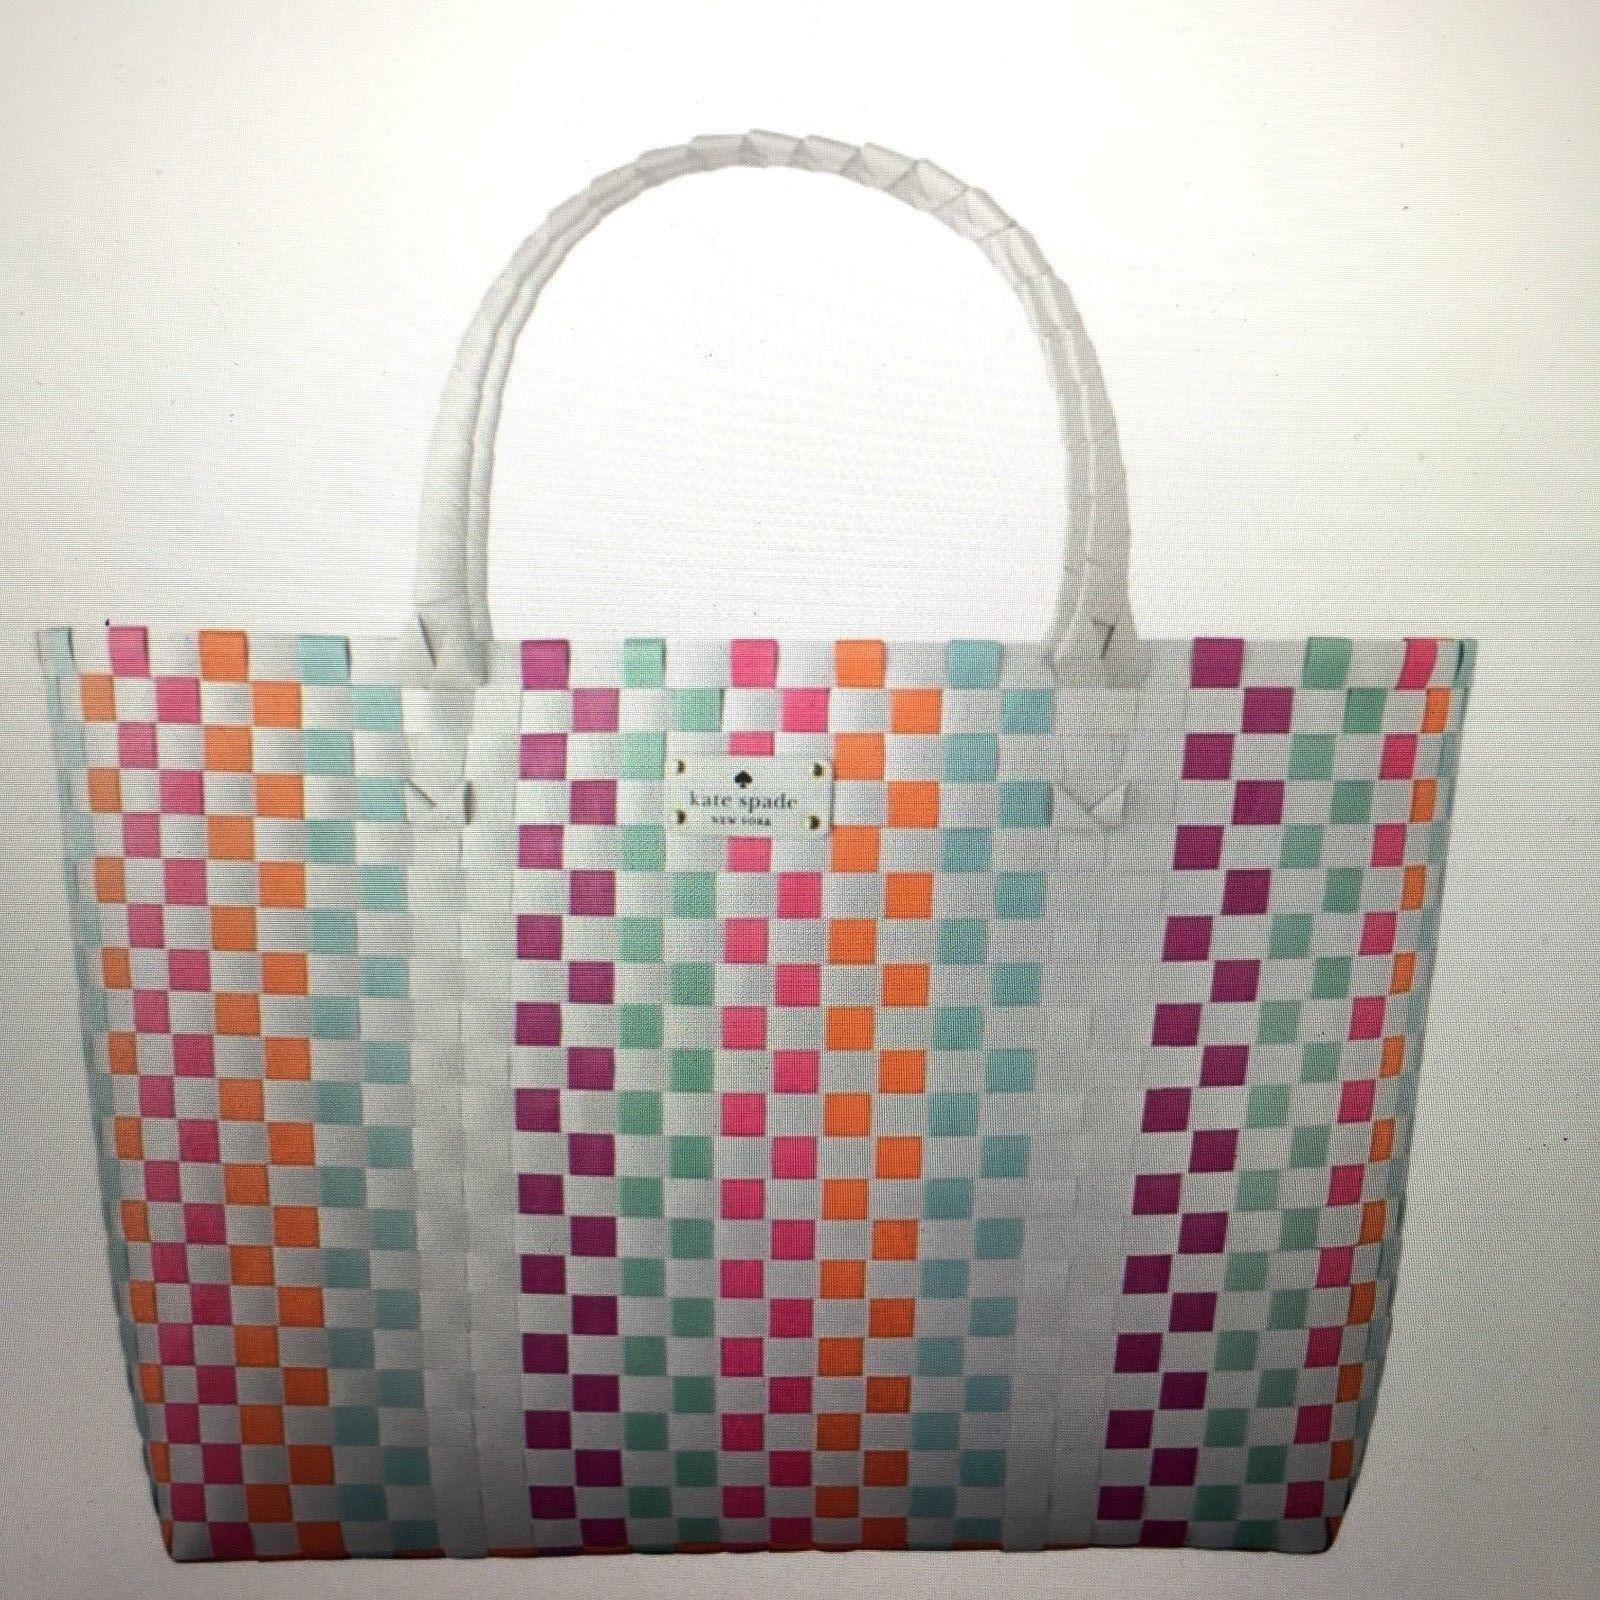 Kate Spade New York Large Multi Color Rainbow Nwt Woven Vinyl Tote Bag Beach